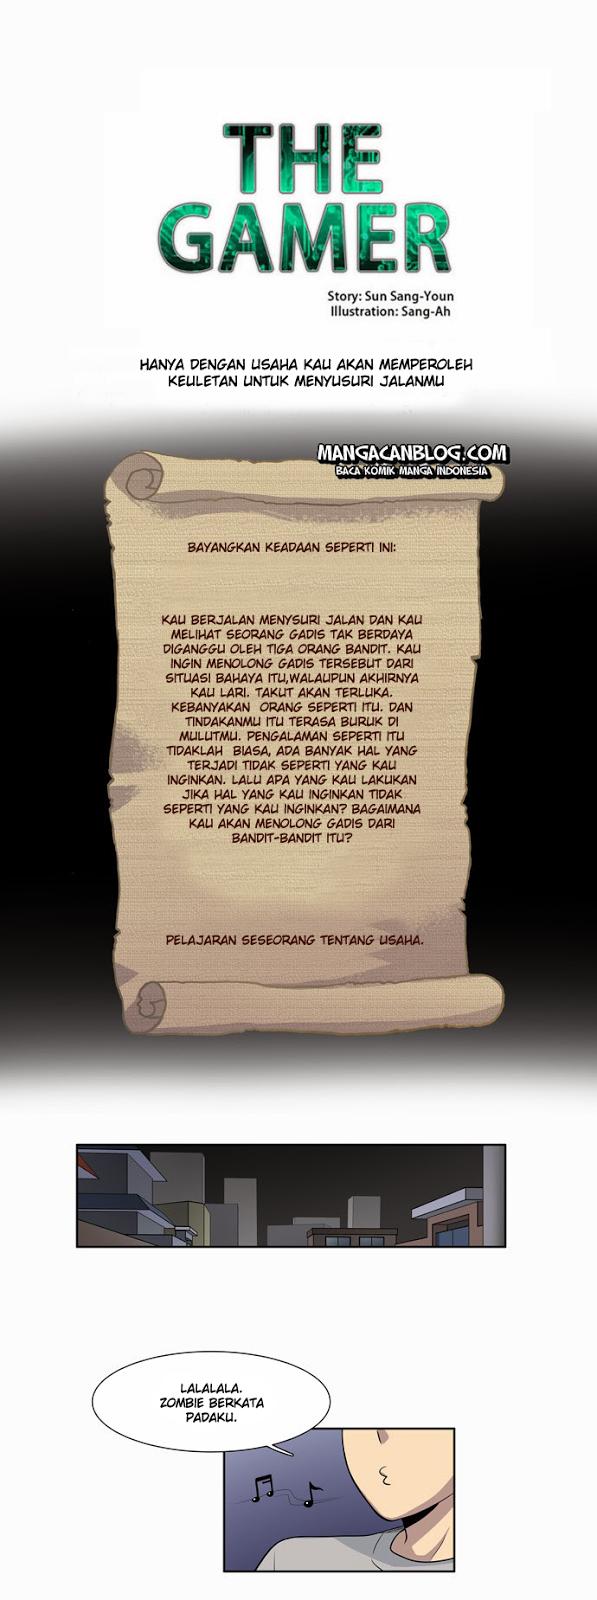 Dilarang COPAS - situs resmi www.mangacanblog.com - Komik the gamer 025 - chapter 25 26 Indonesia the gamer 025 - chapter 25 Terbaru |Baca Manga Komik Indonesia|Mangacan